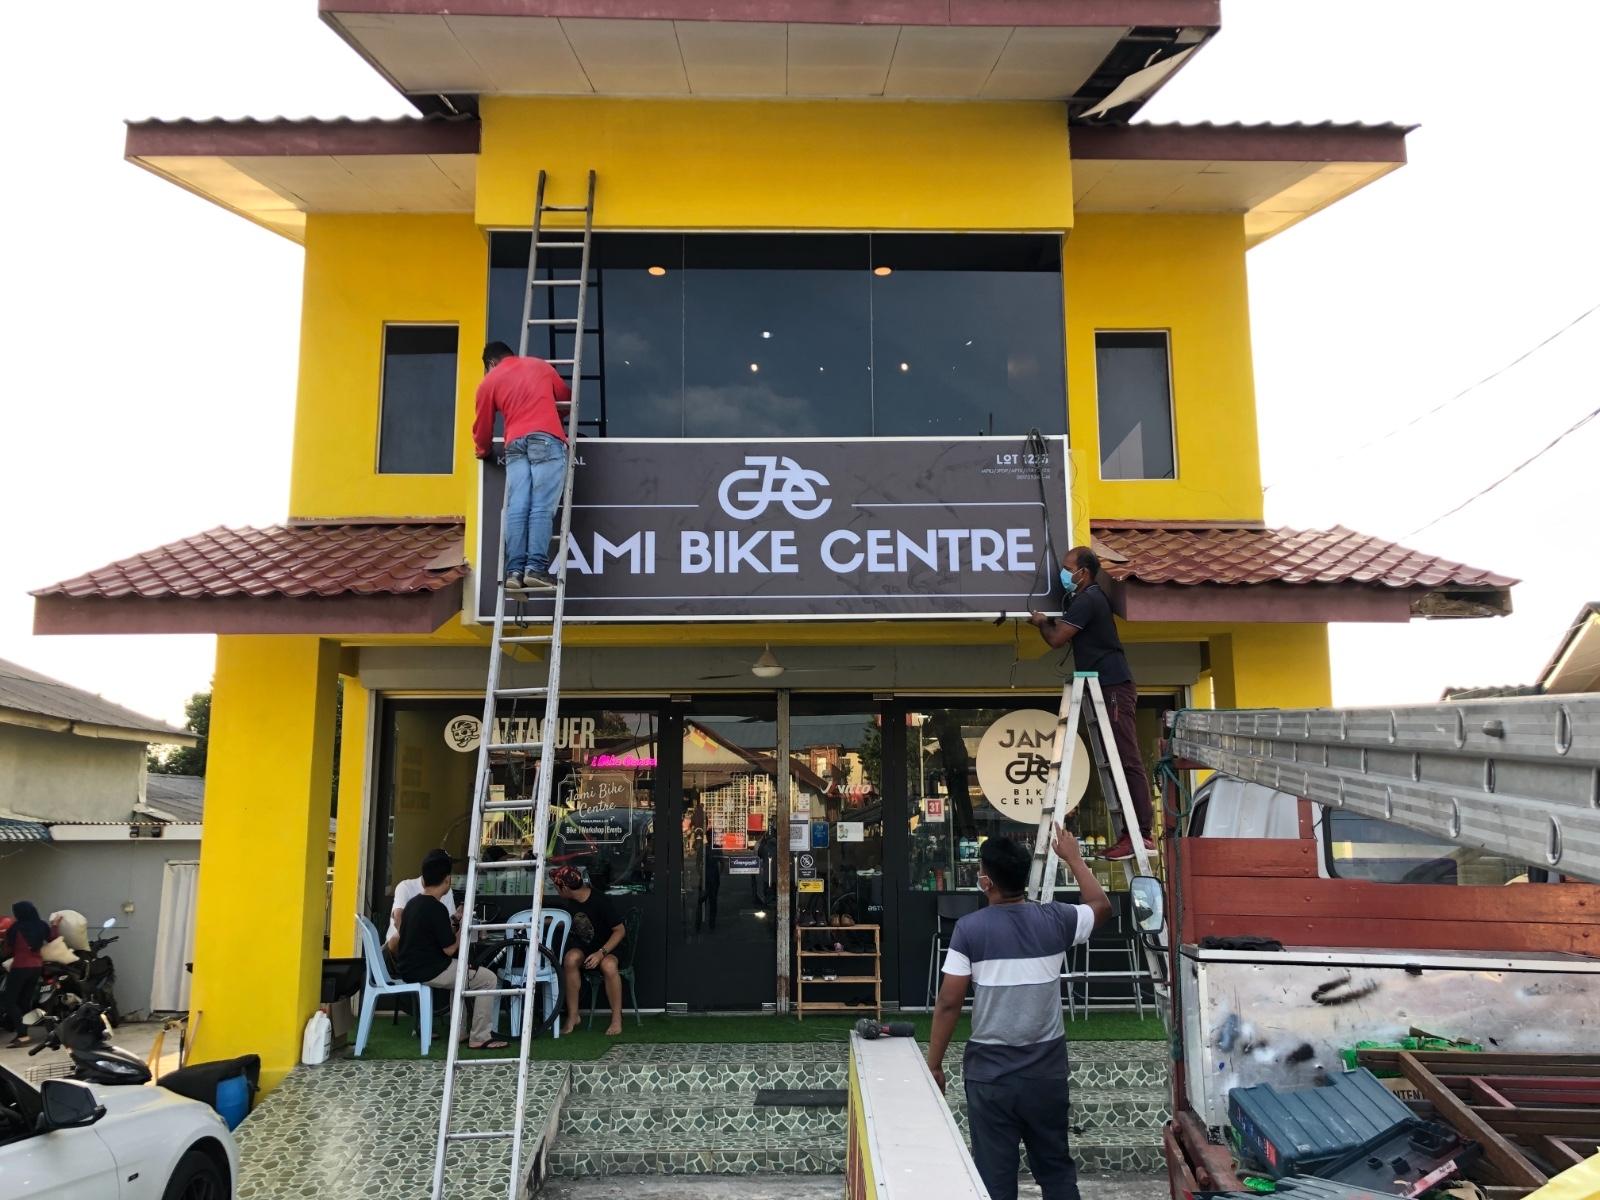 Lightboard (Jami Bike Centre) Kedai Basikal Signboard